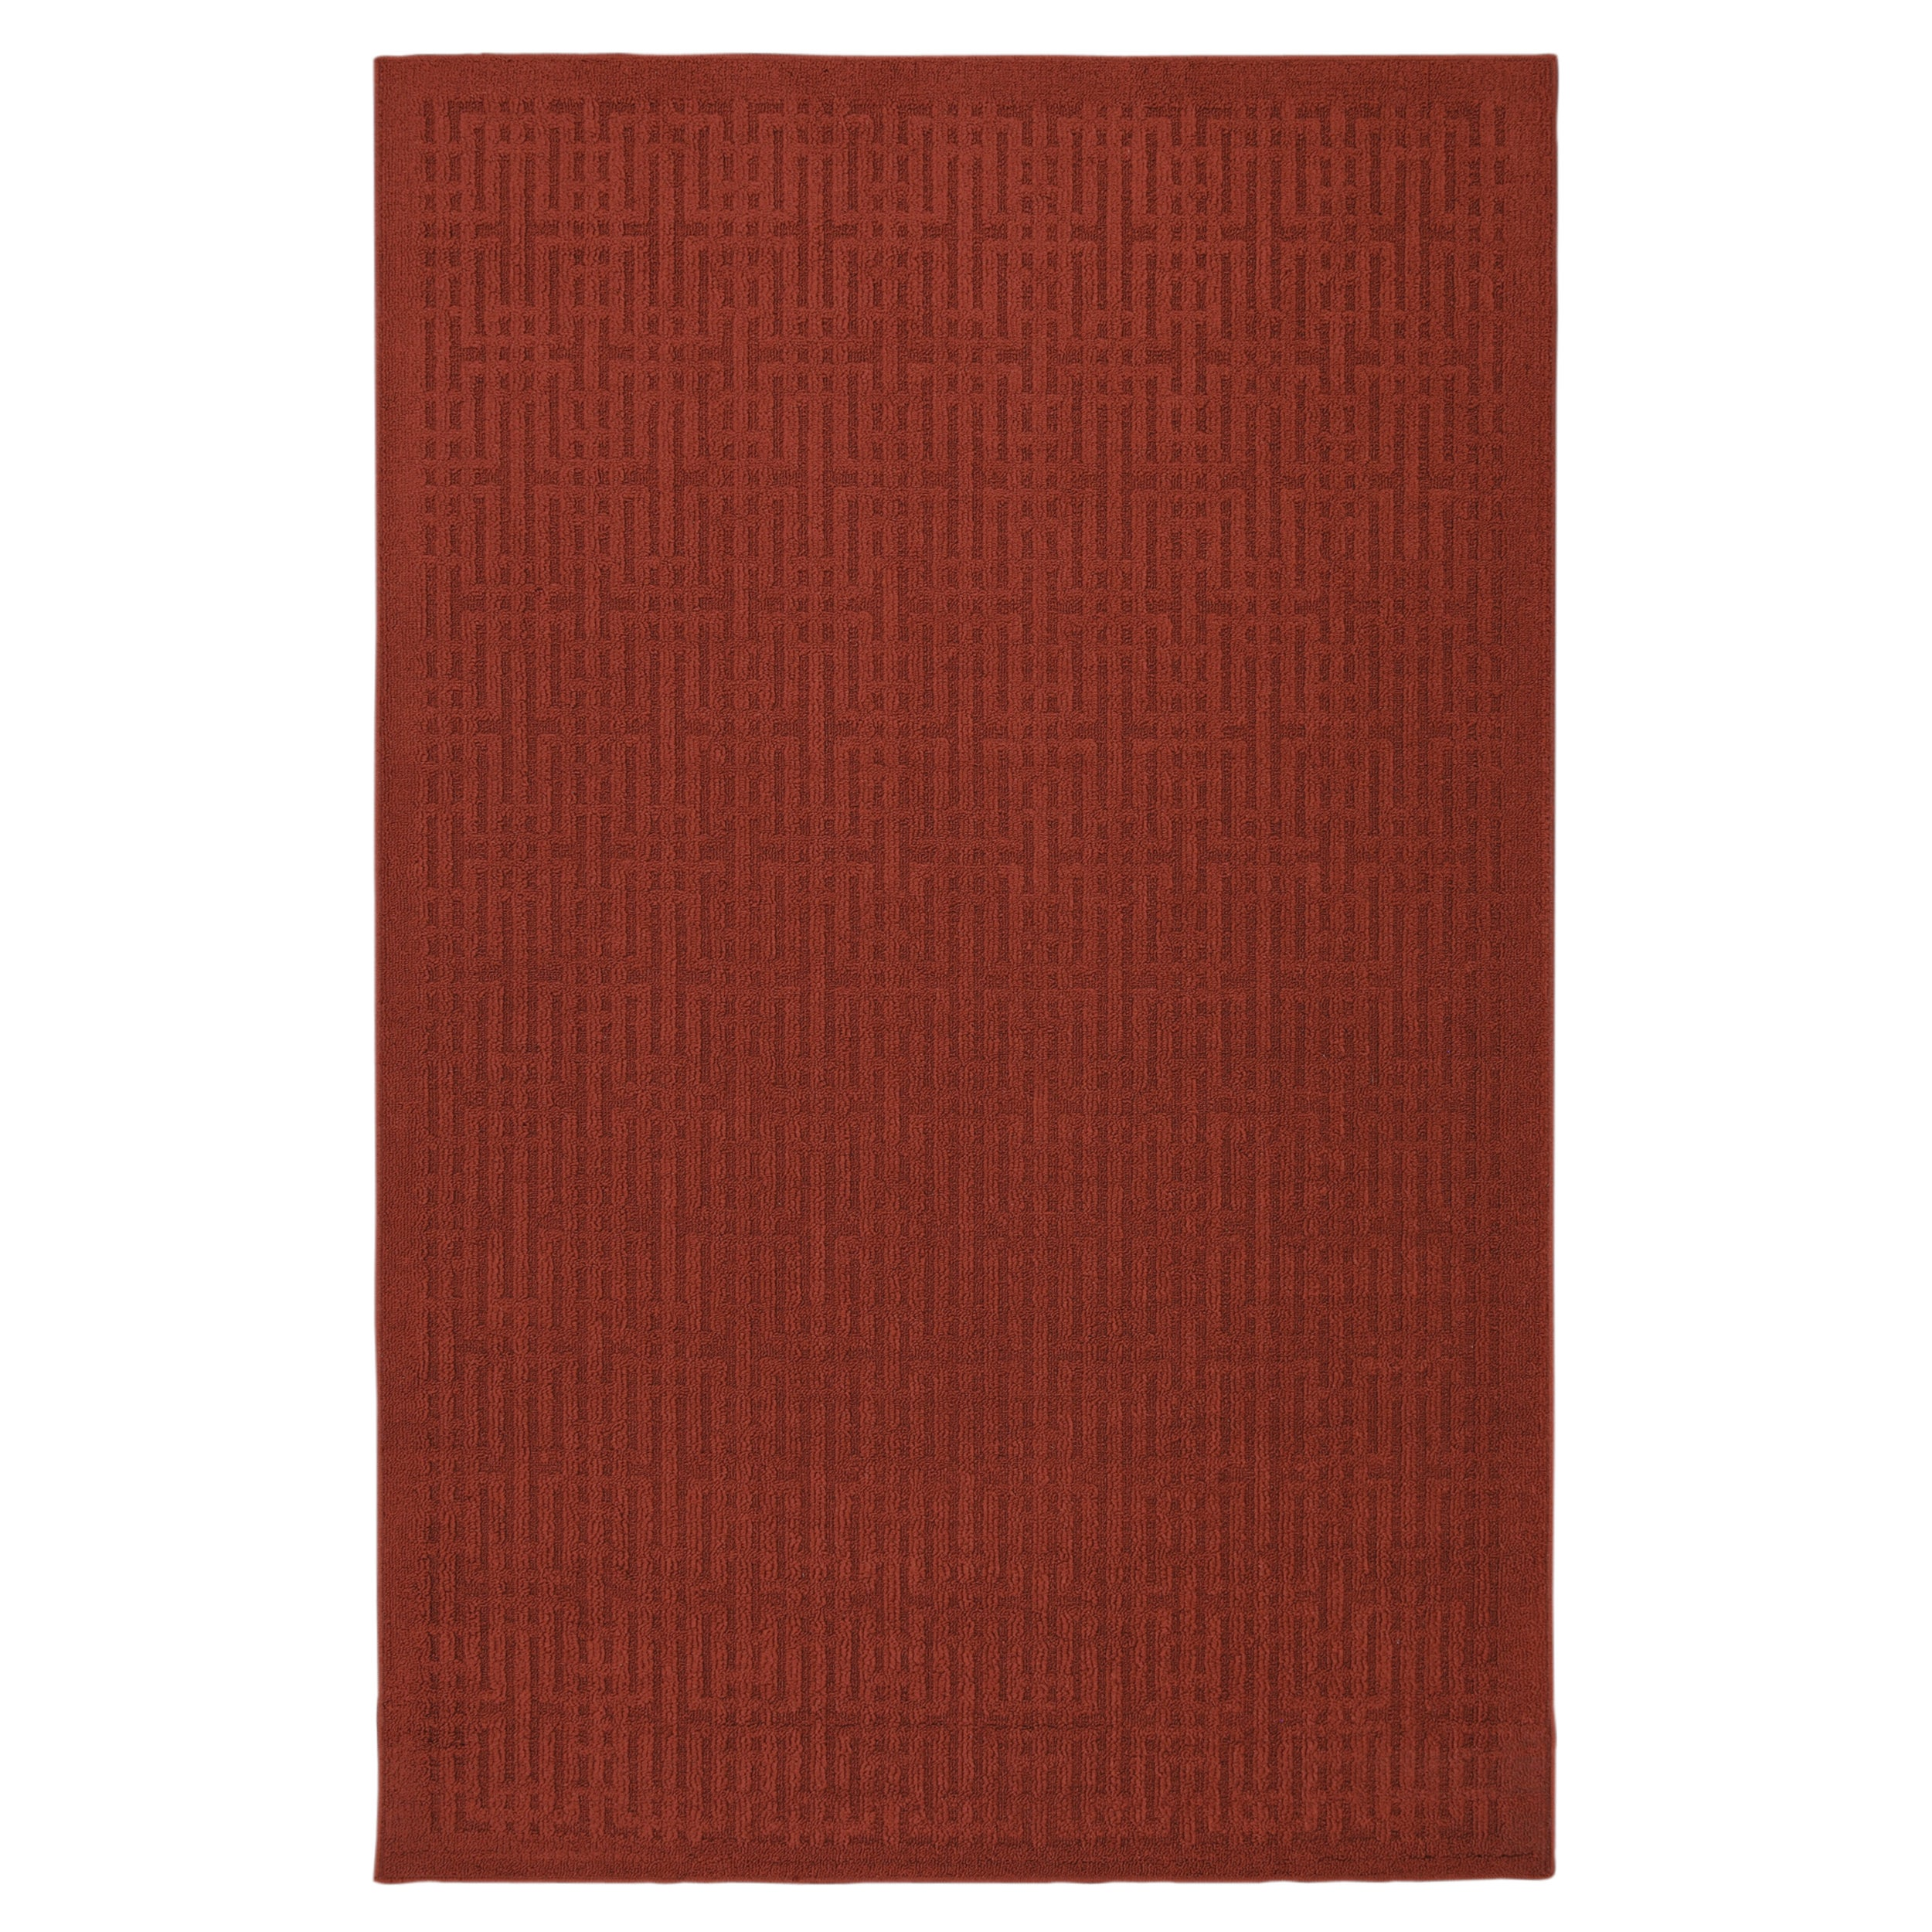 Stacks Madder Rusty Red Rug (1'8 x 5')